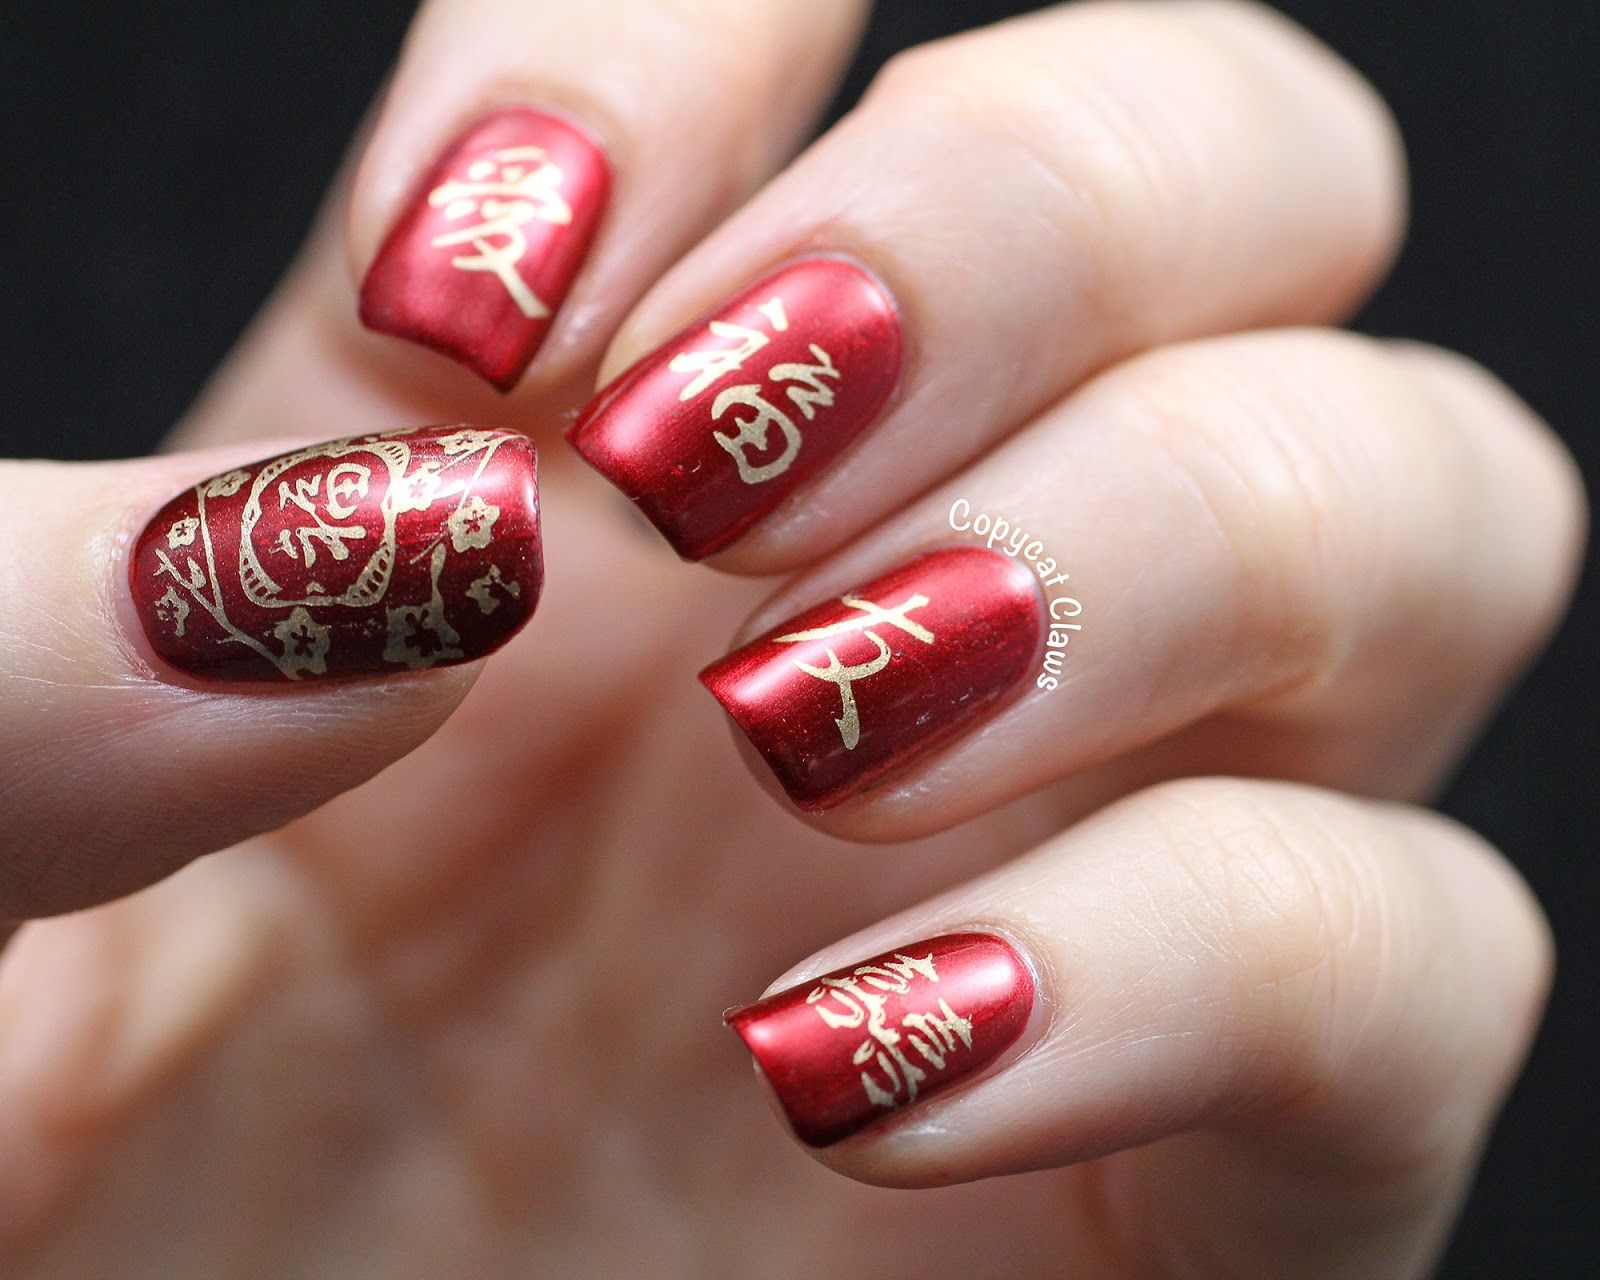 Chinese New Year Nail Art Aka Sunday Stamping On A Thursday New Years Nail Art Gel Nail Art Designs New Years Nail Designs